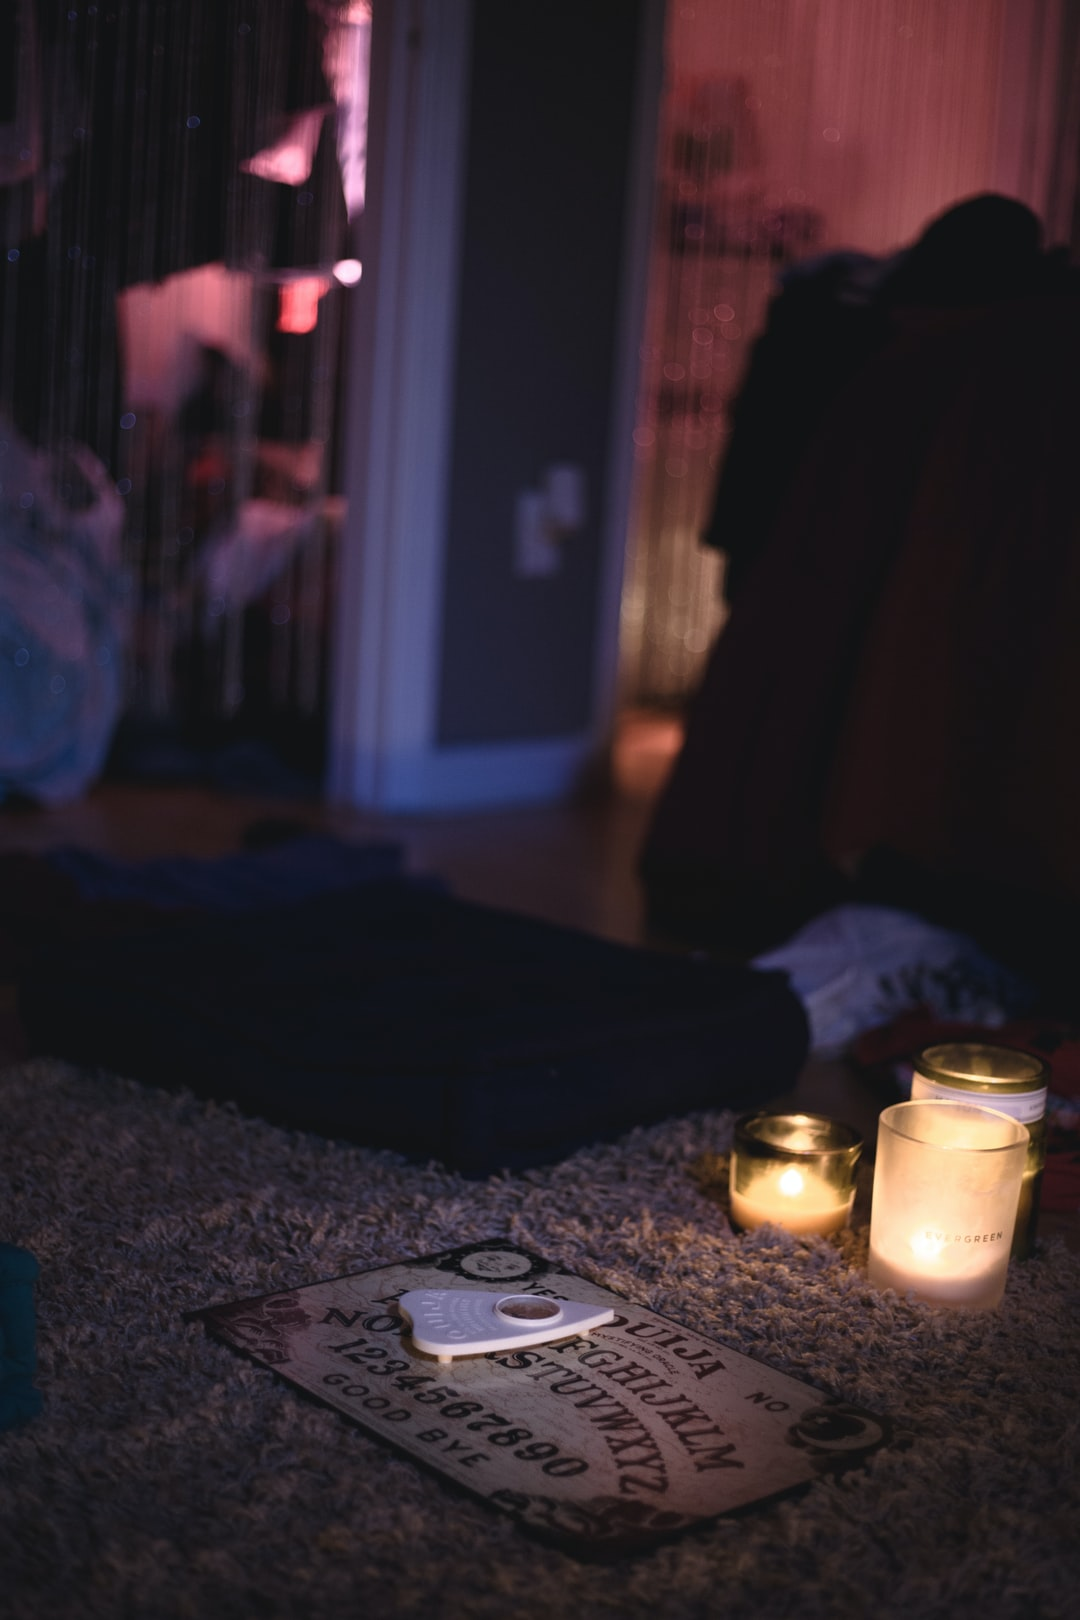 Ouija Board on a bedroom floor